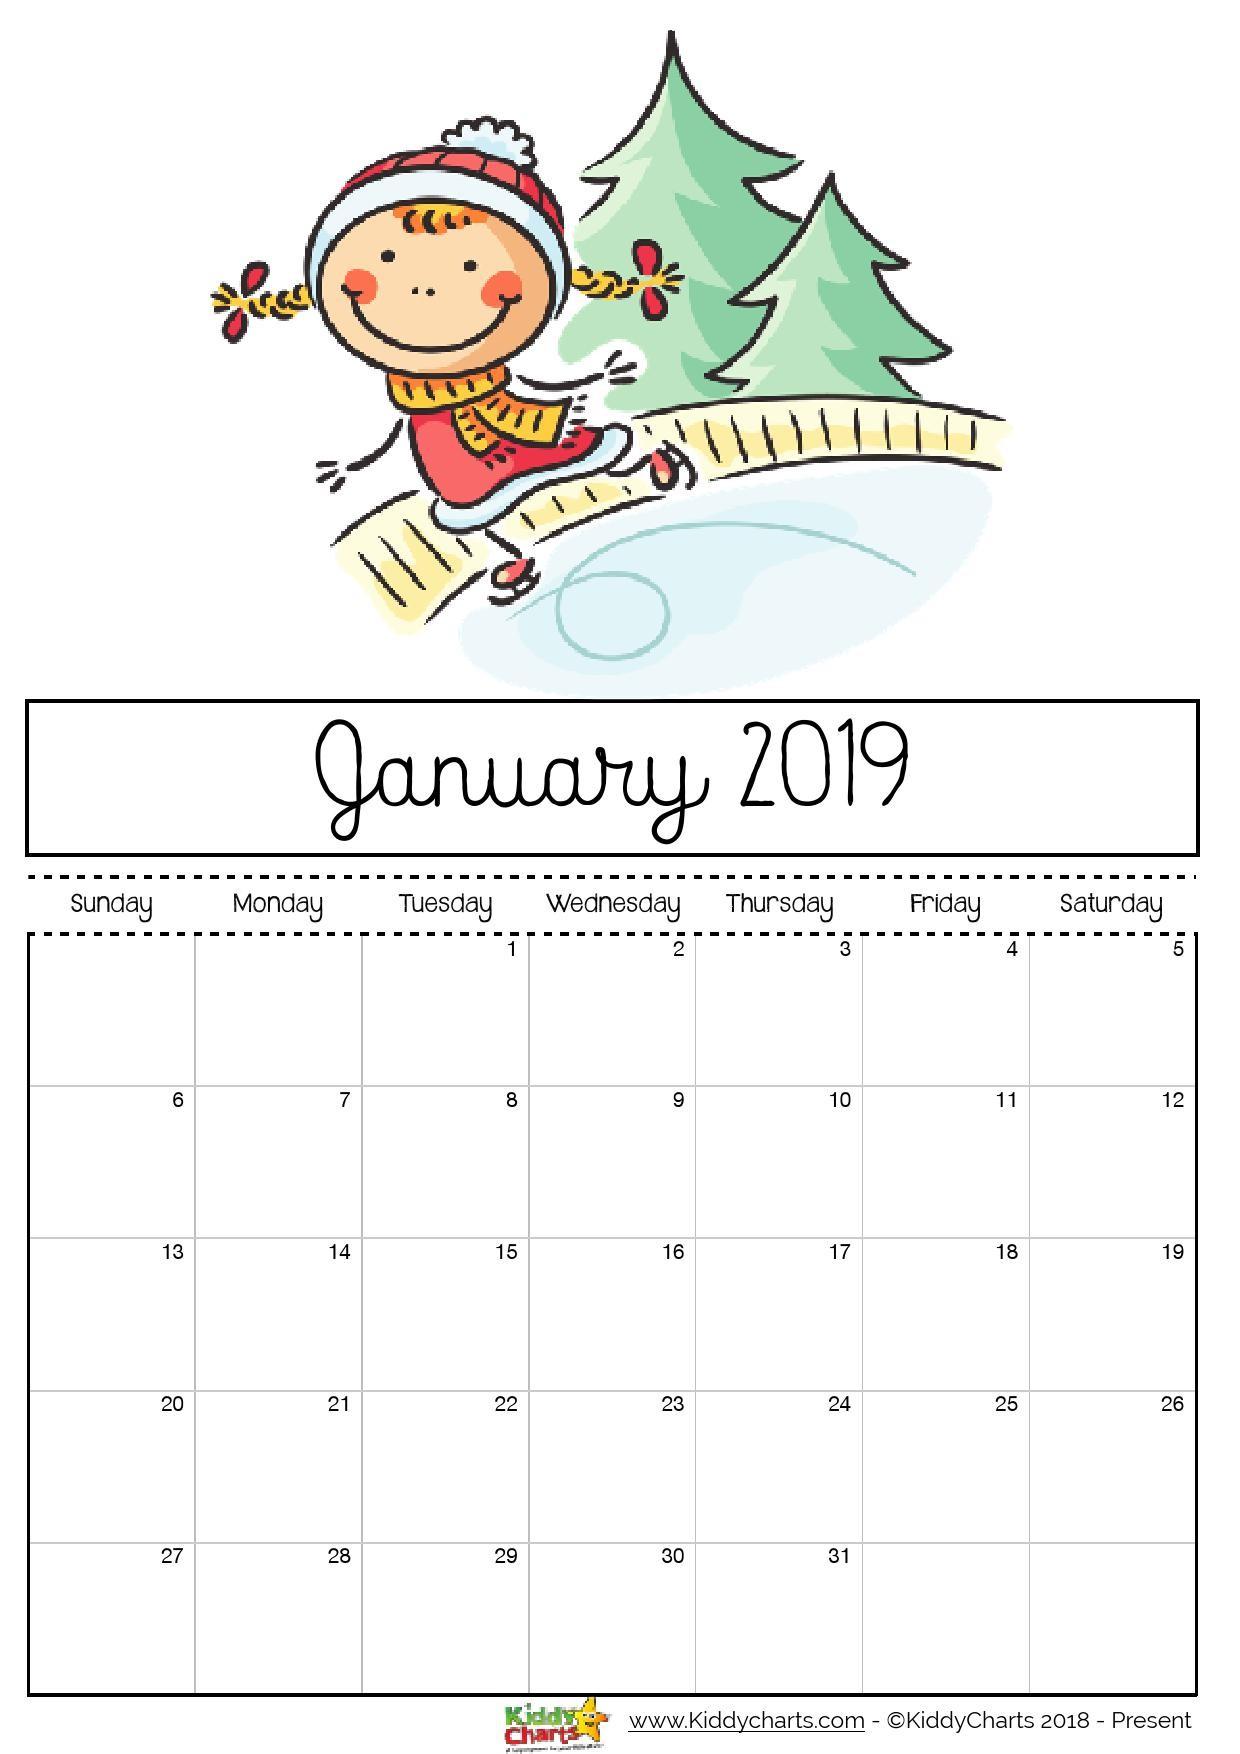 Free printable 2019 calendar for kids